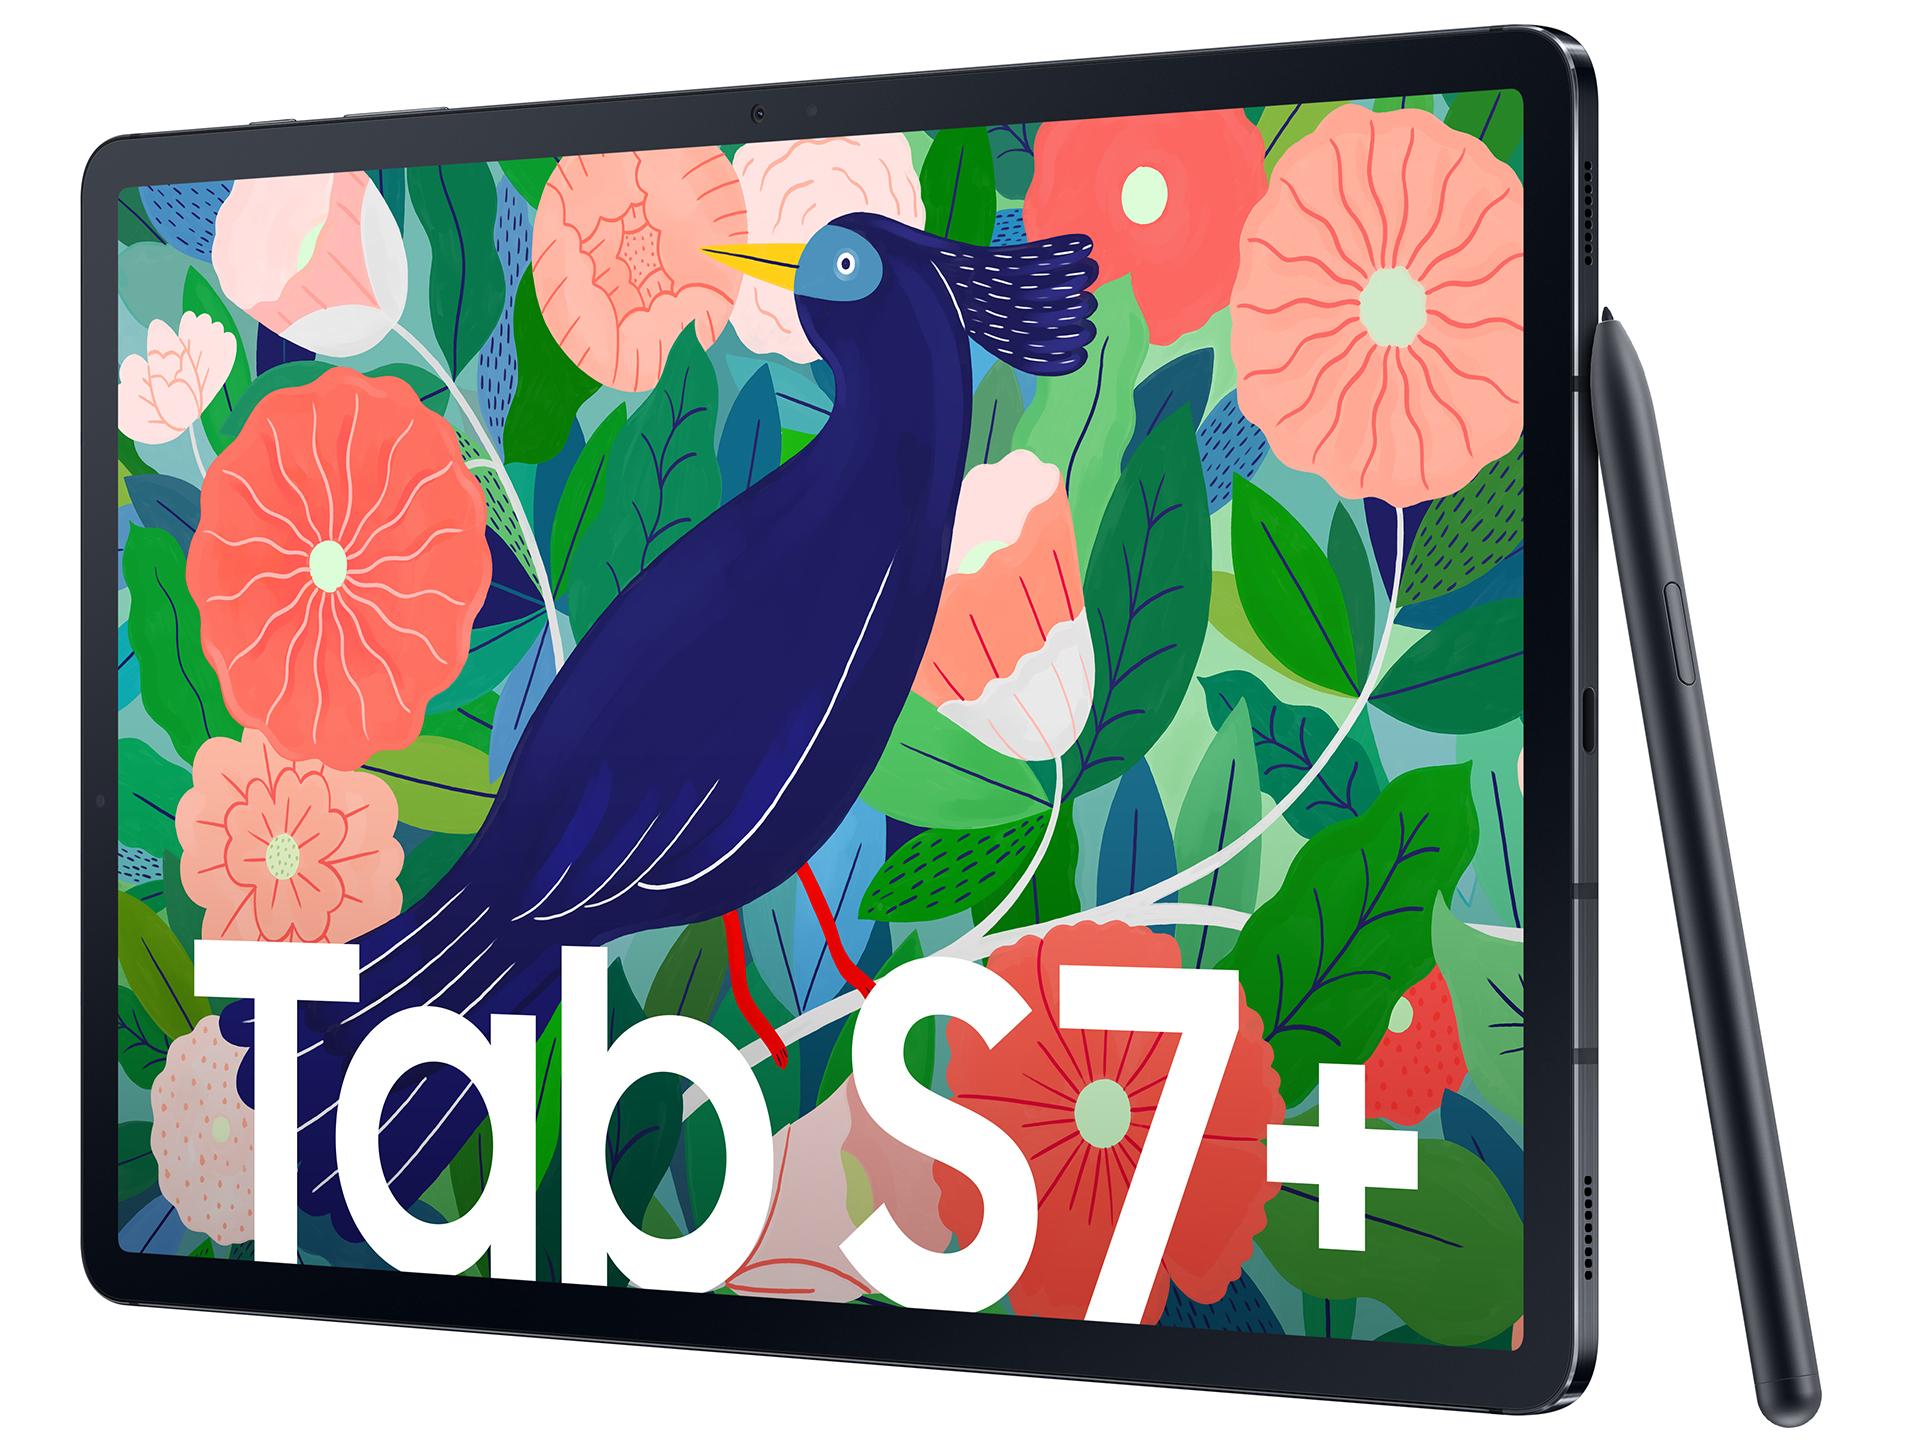 https://www.notebookcheck.net/fileadmin/Notebooks/Samsung/Galaxy_Tab_S7_Plus/Pictures_Samsung_Galaxy_Tab_S7_Plus_8282.jpg